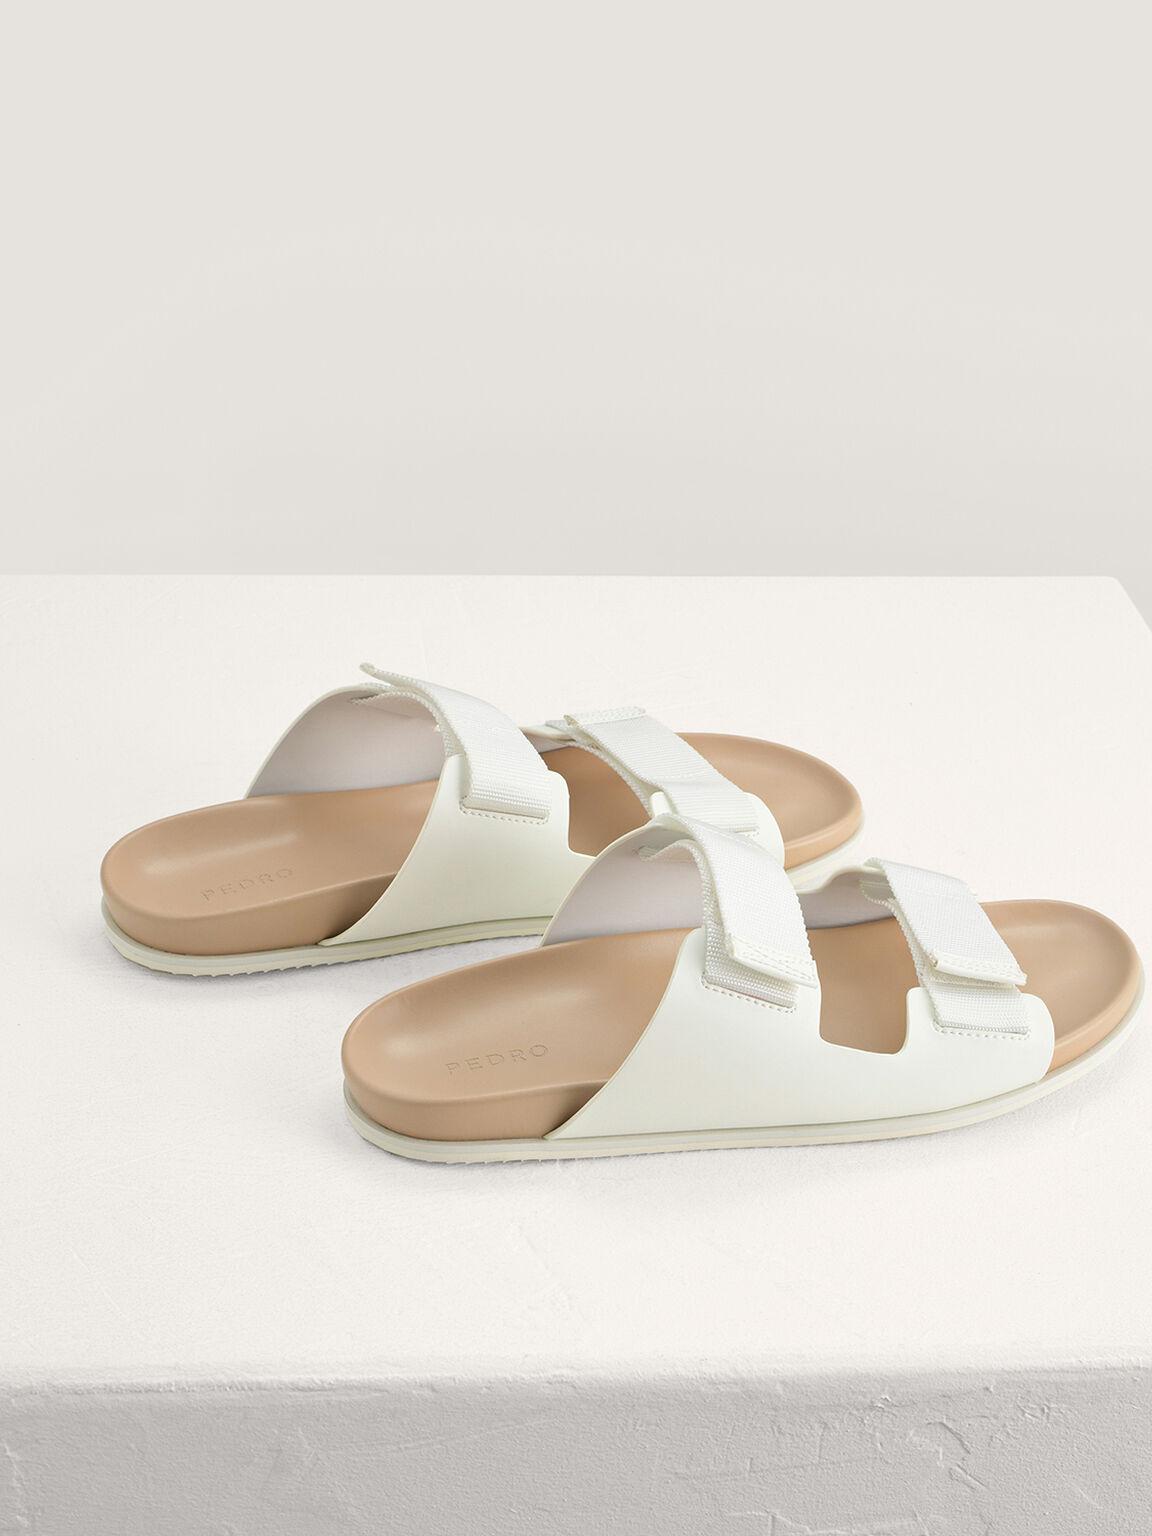 Double Strap Velcro Sandals, White, hi-res